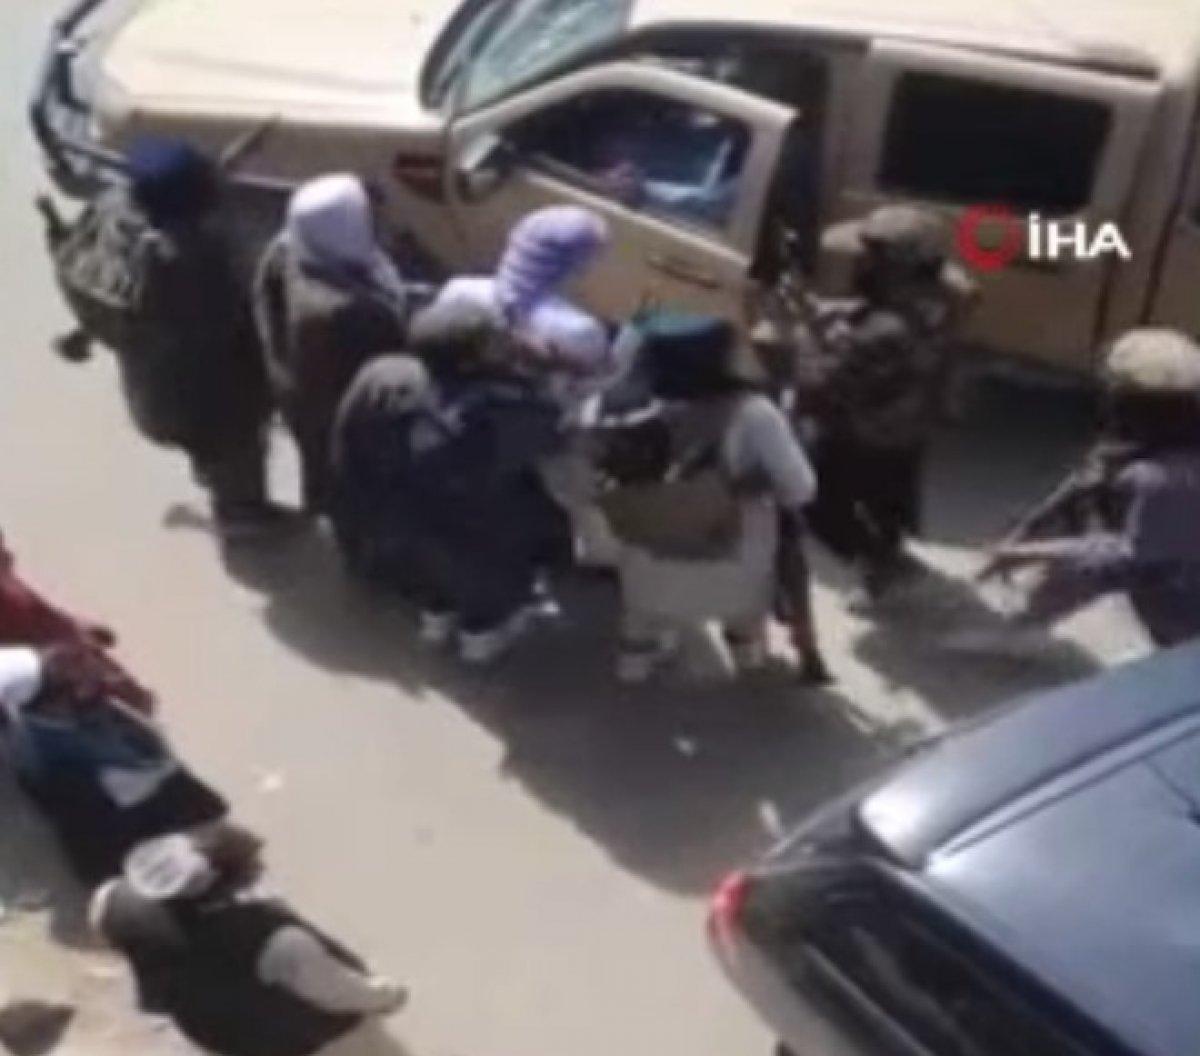 Taliban ın Afganistan bayrağı taşıyanlara müdahalesi  #5